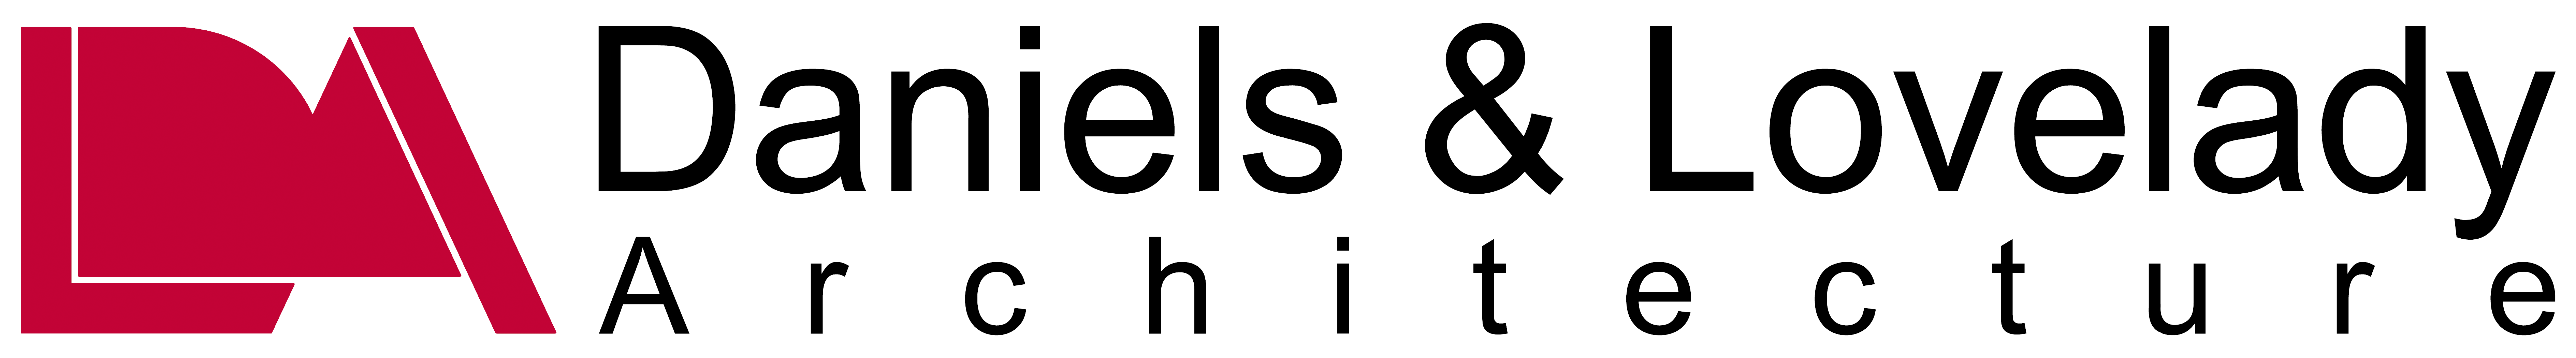 DLA Logo - Daniels & Lovelady Architecture